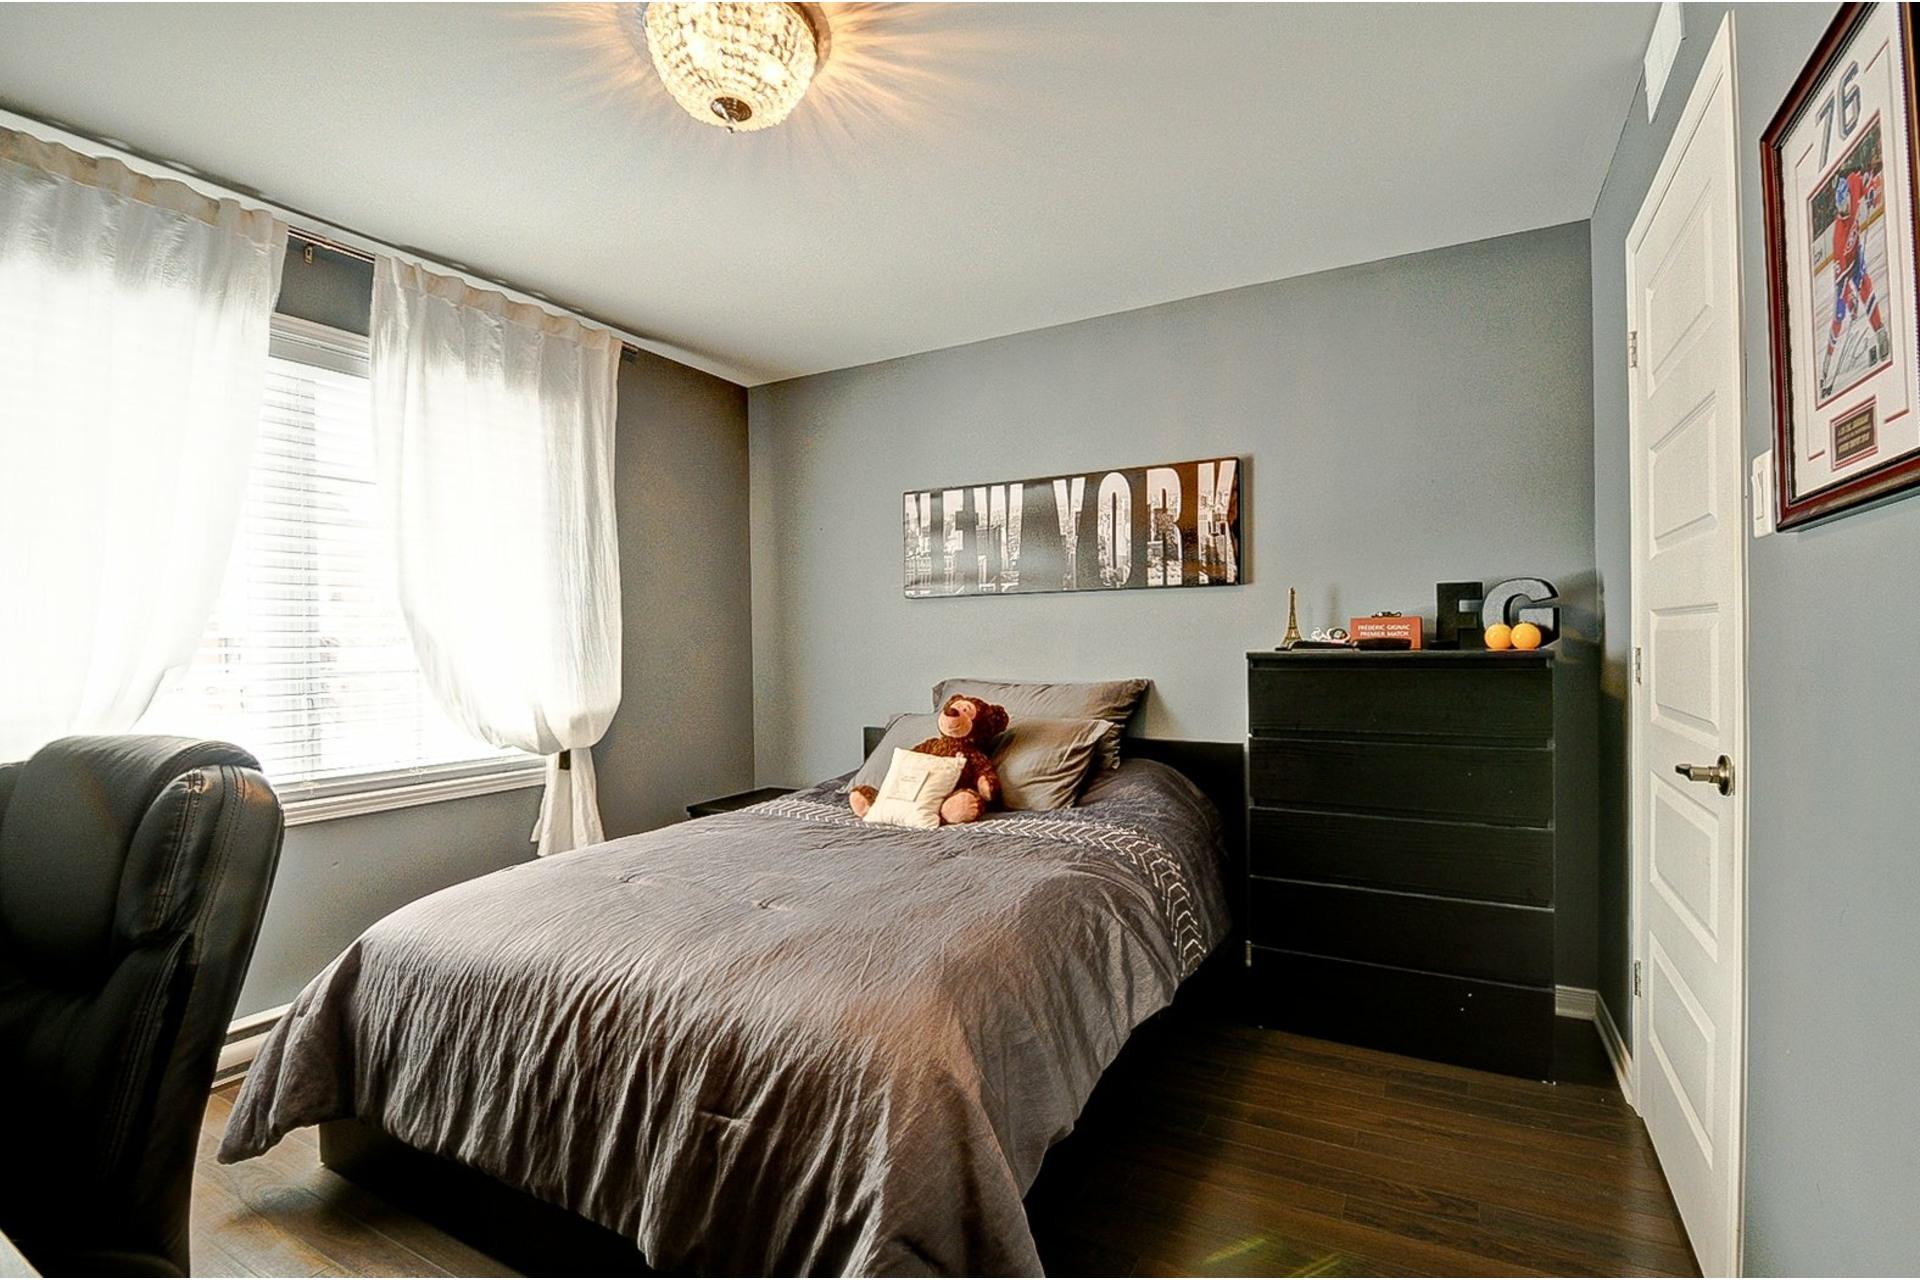 image 15 - Apartment For sale Vaudreuil-Dorion - 7 rooms